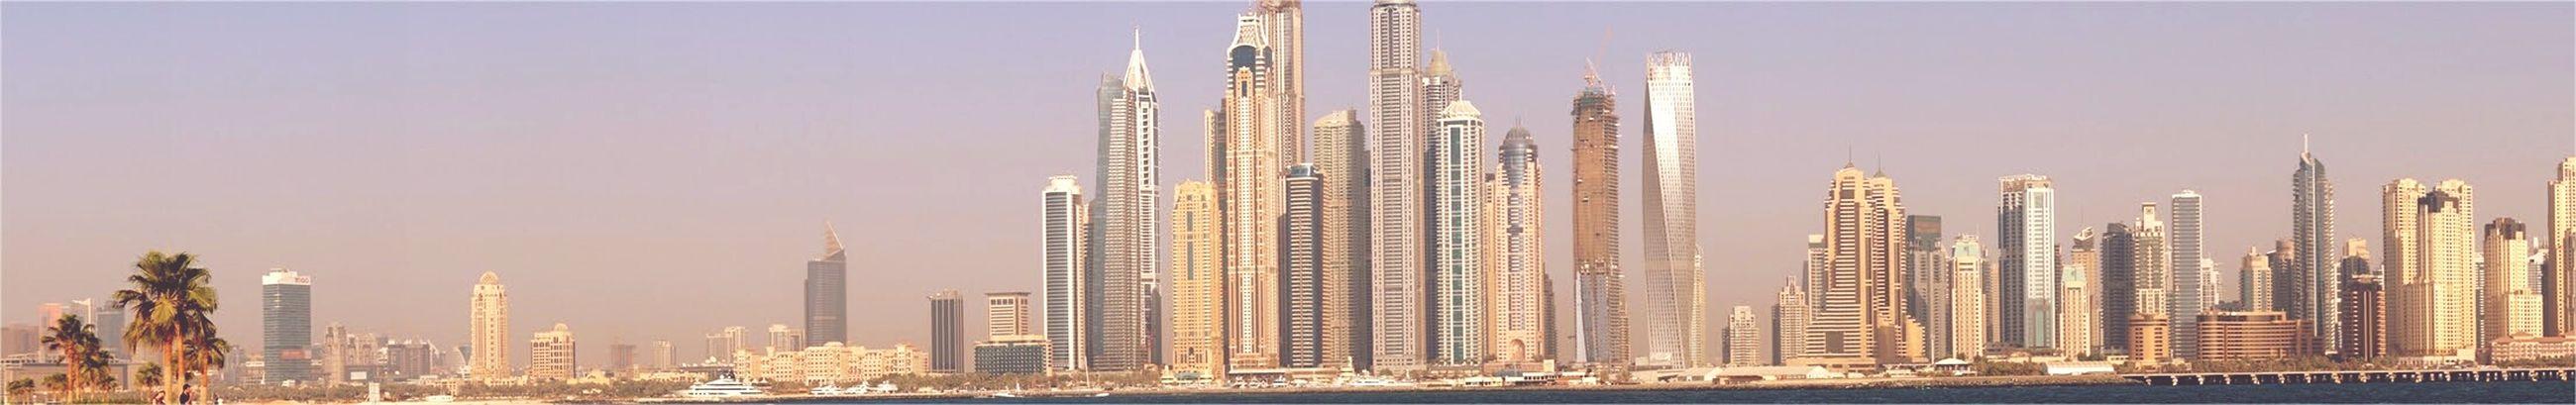 The Adventure Handbook Panorama Dubai Cityscapes